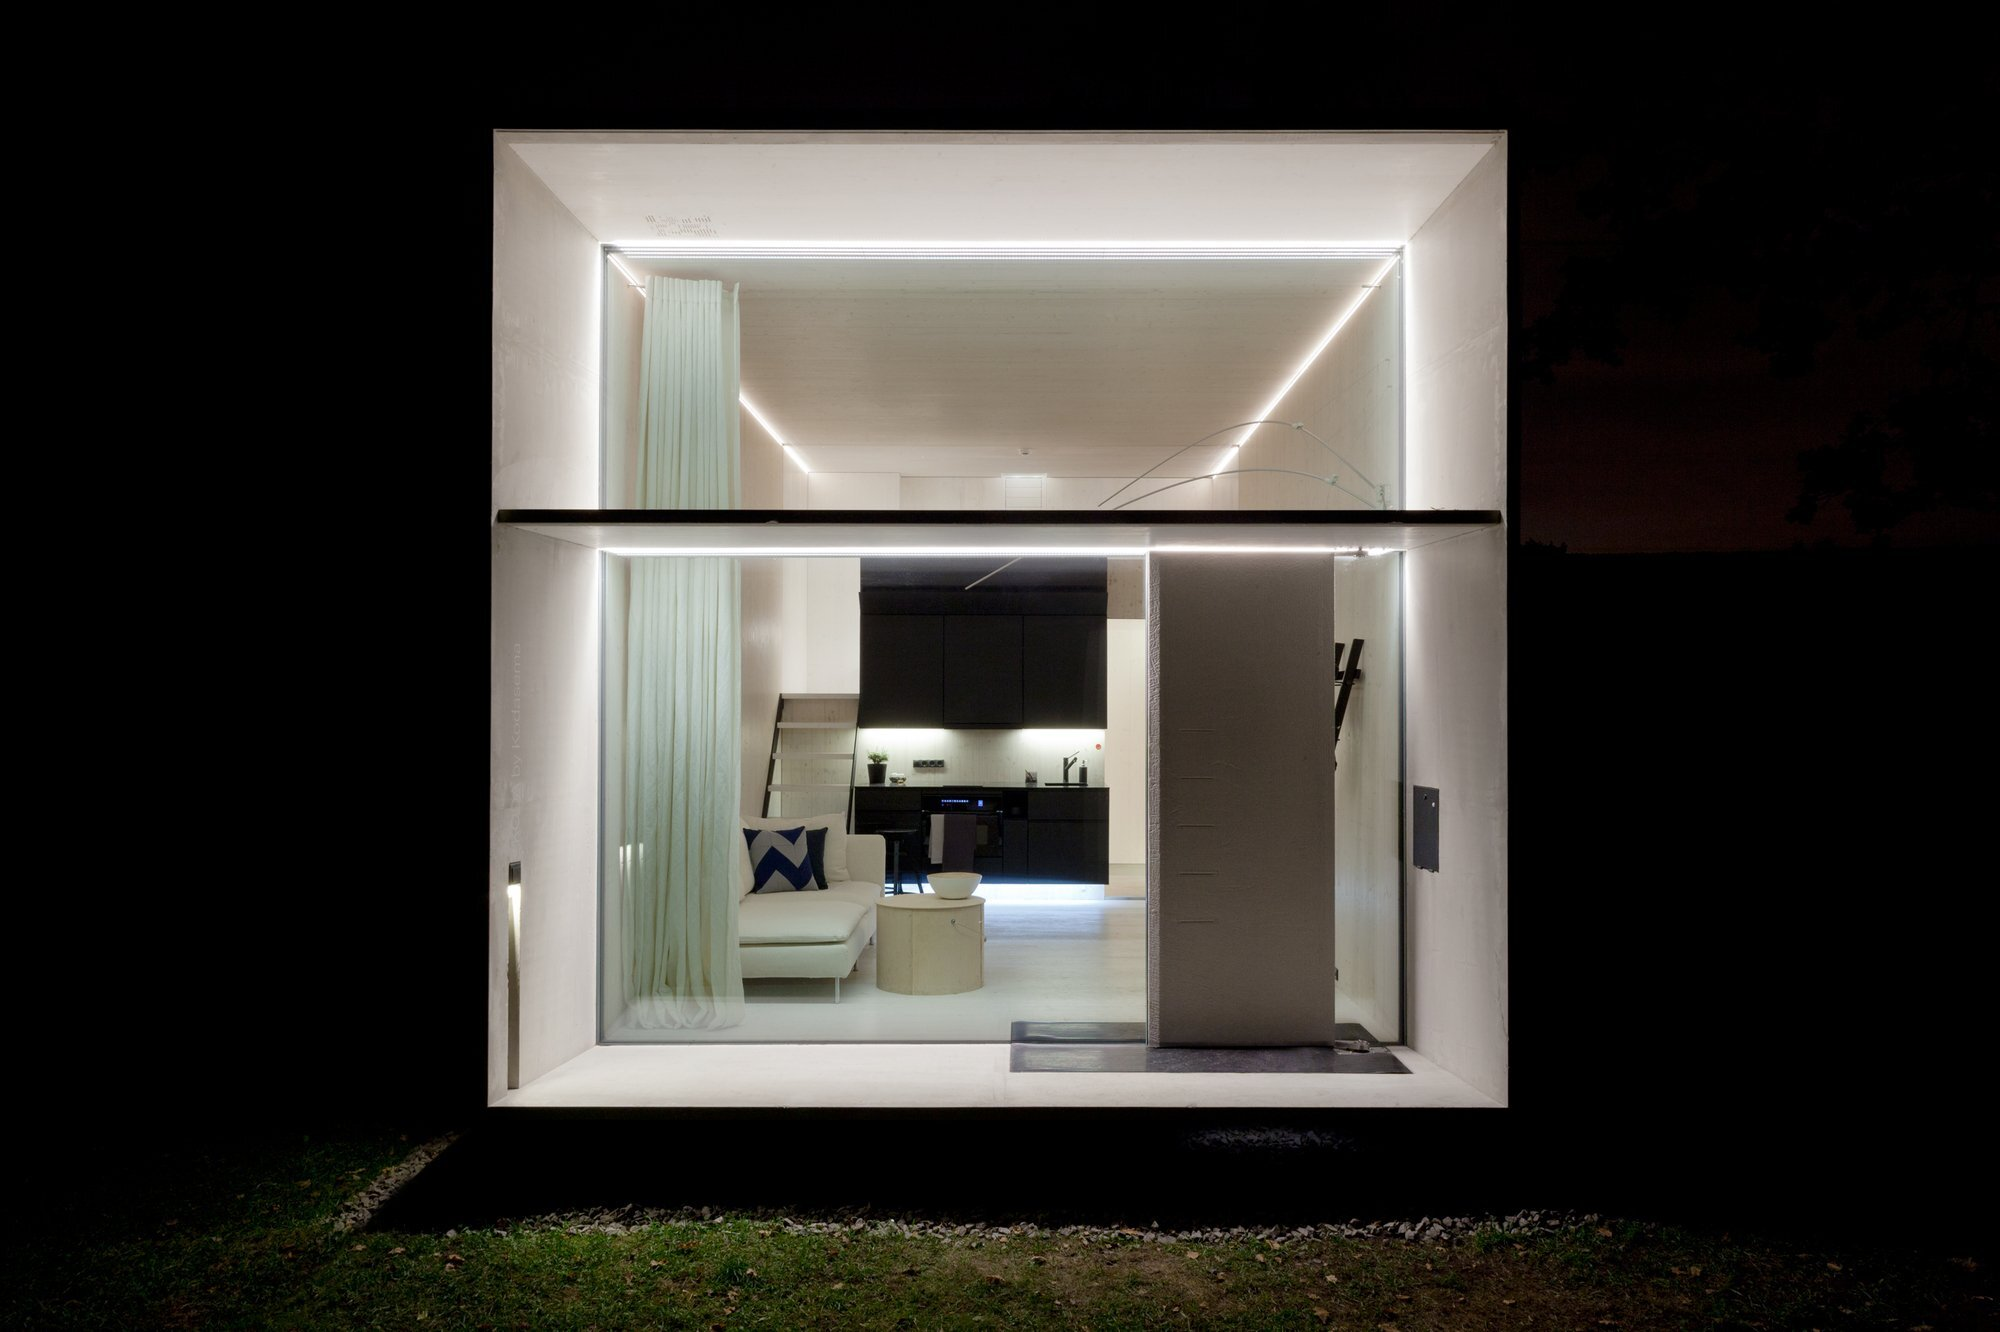 KODA - Kodasema - Estonia - Exterior 4 At Night - Humble Homes